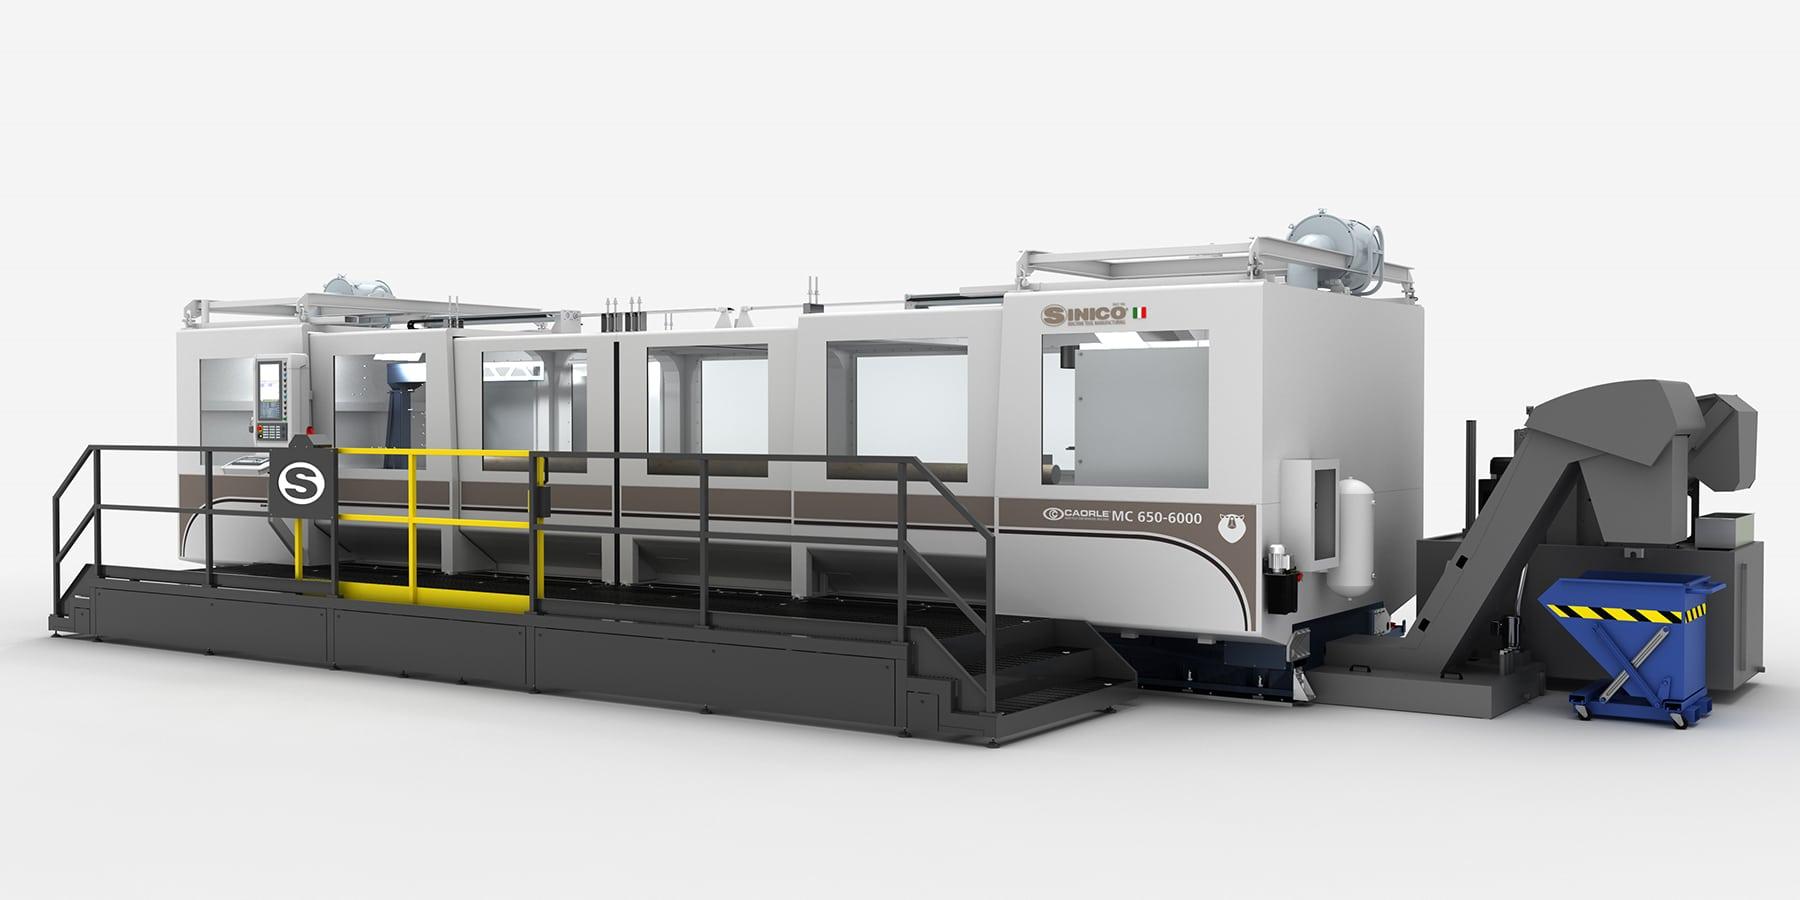 sinico manufacturing macchinari